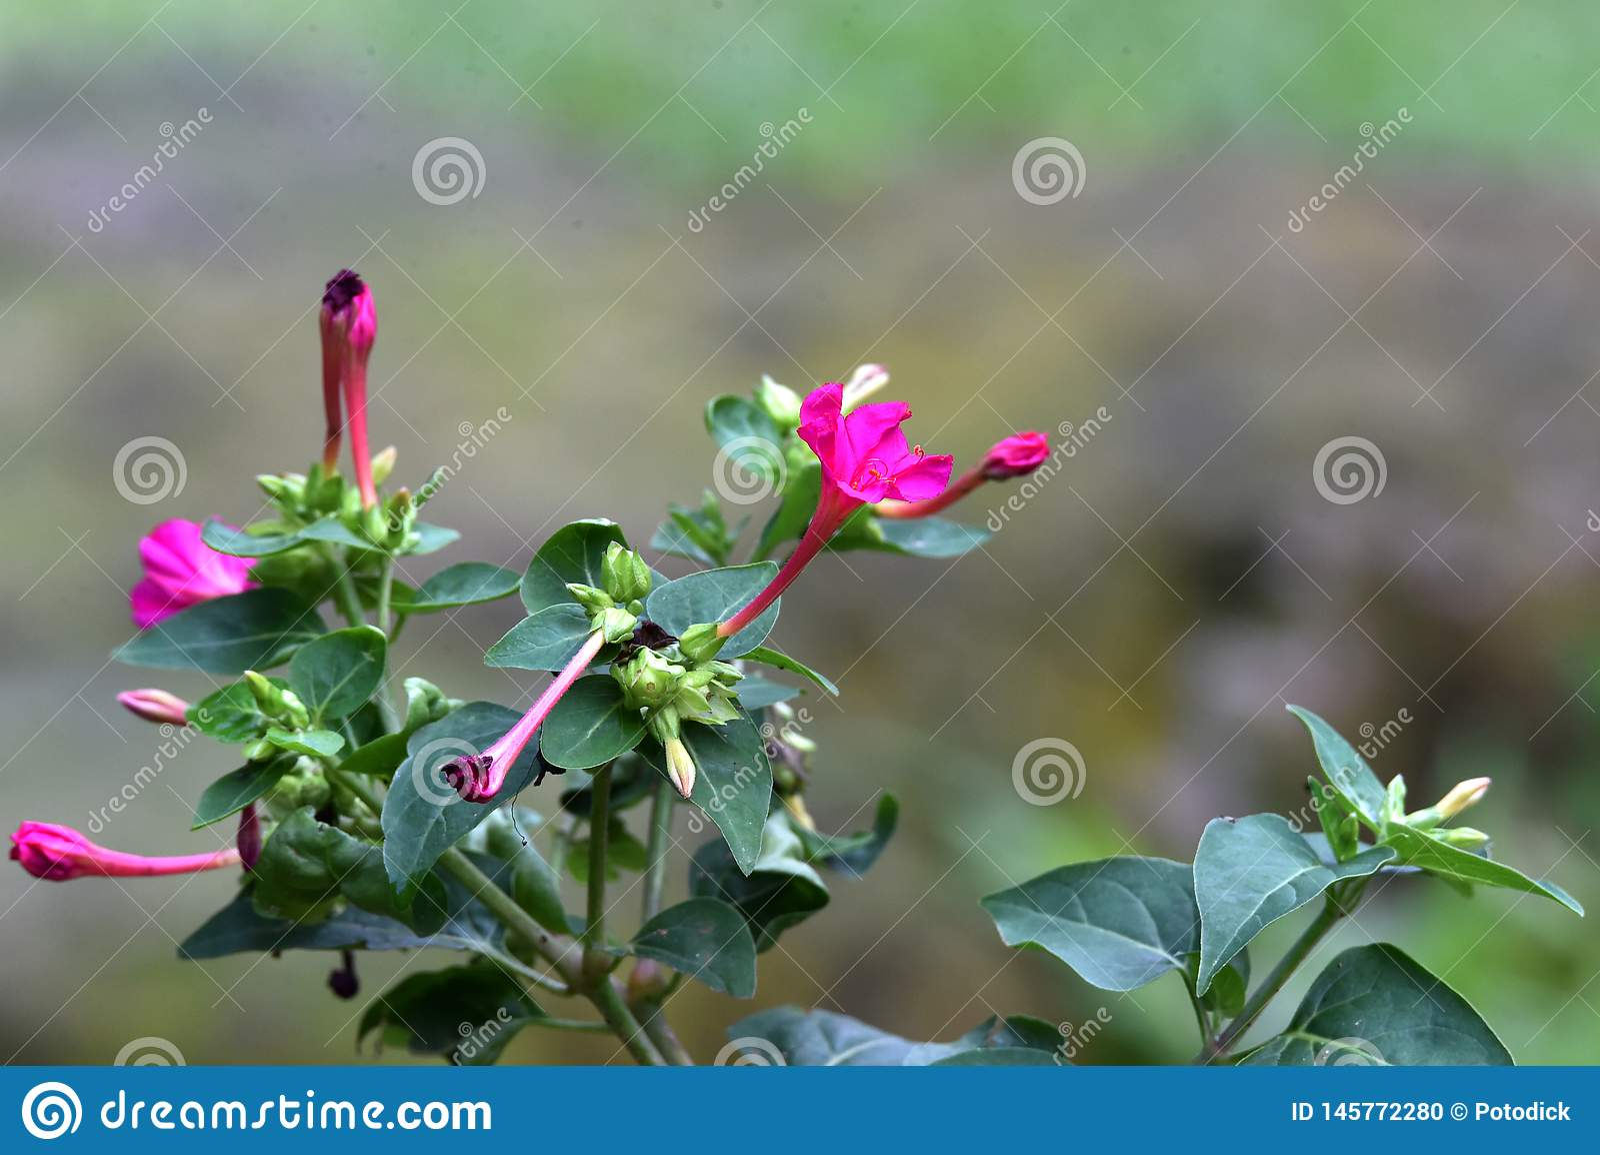 Purple flowers, elongated, like amethyst, with buds beside them